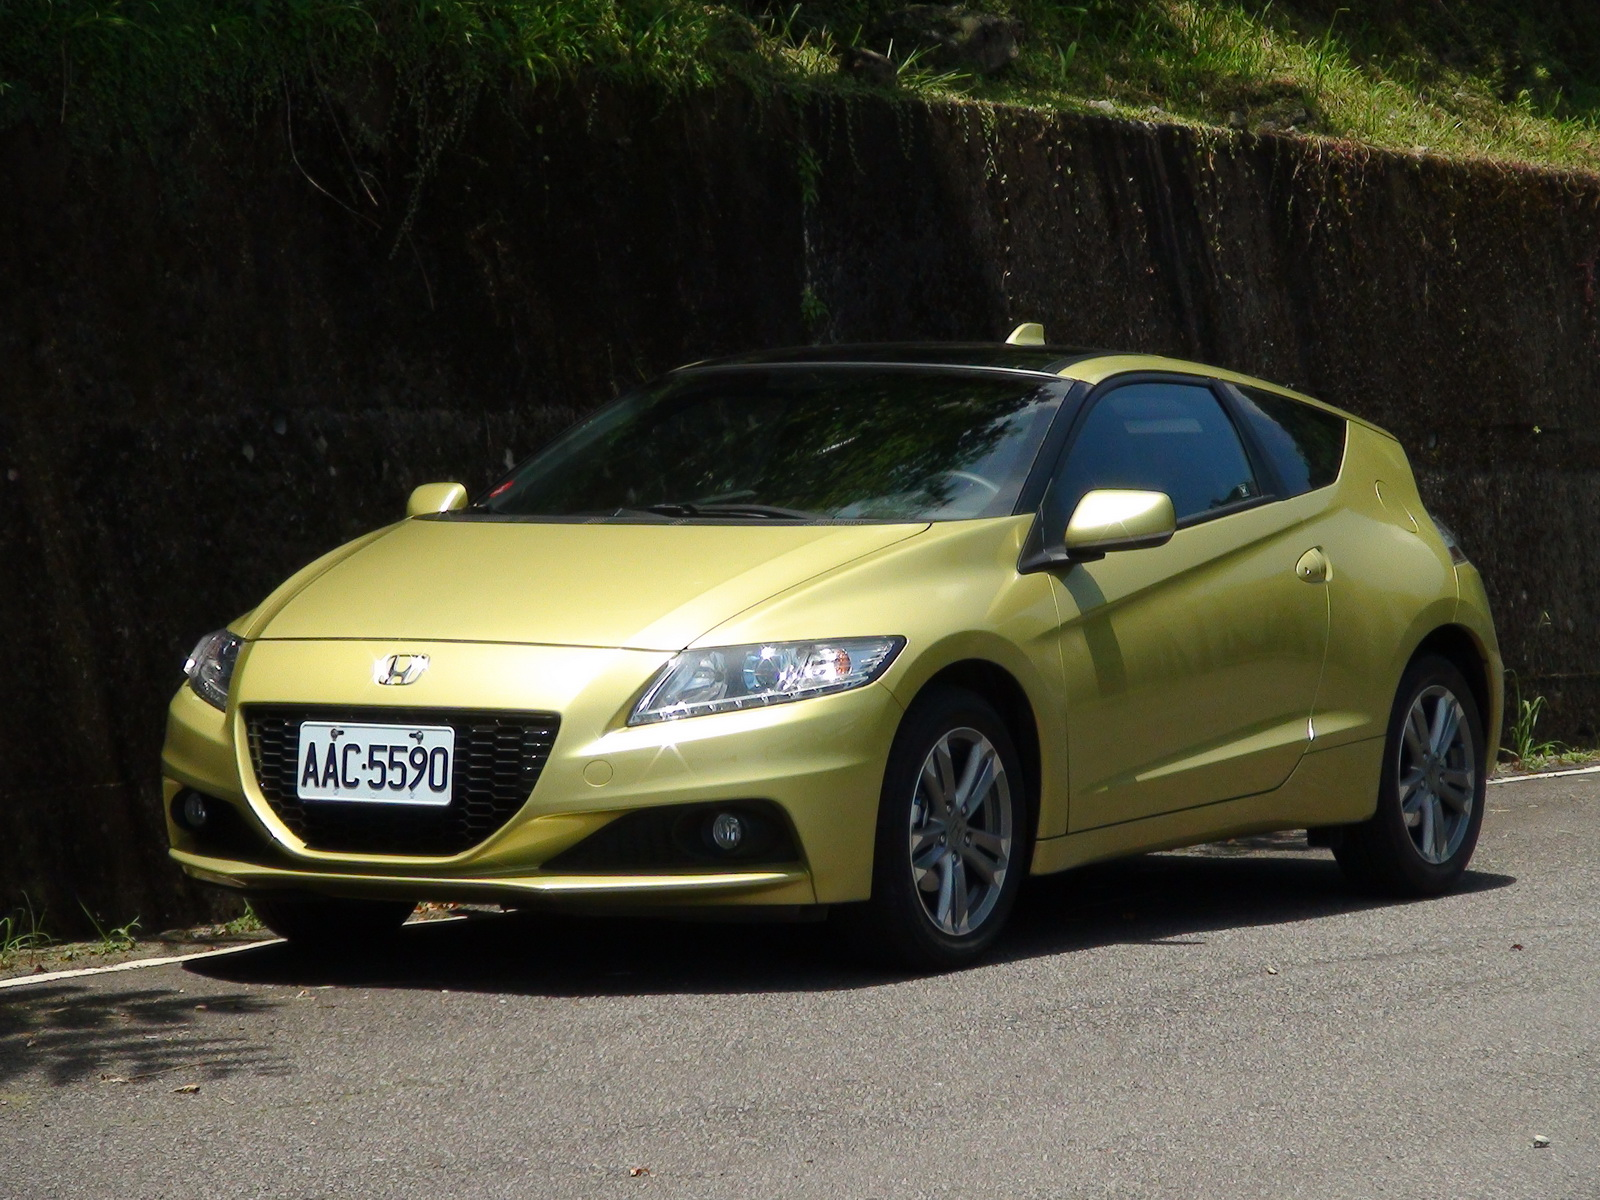 2013 Honda CR-Z渦輪體感試駕!本田的 Hybrid原來是這樣子玩的